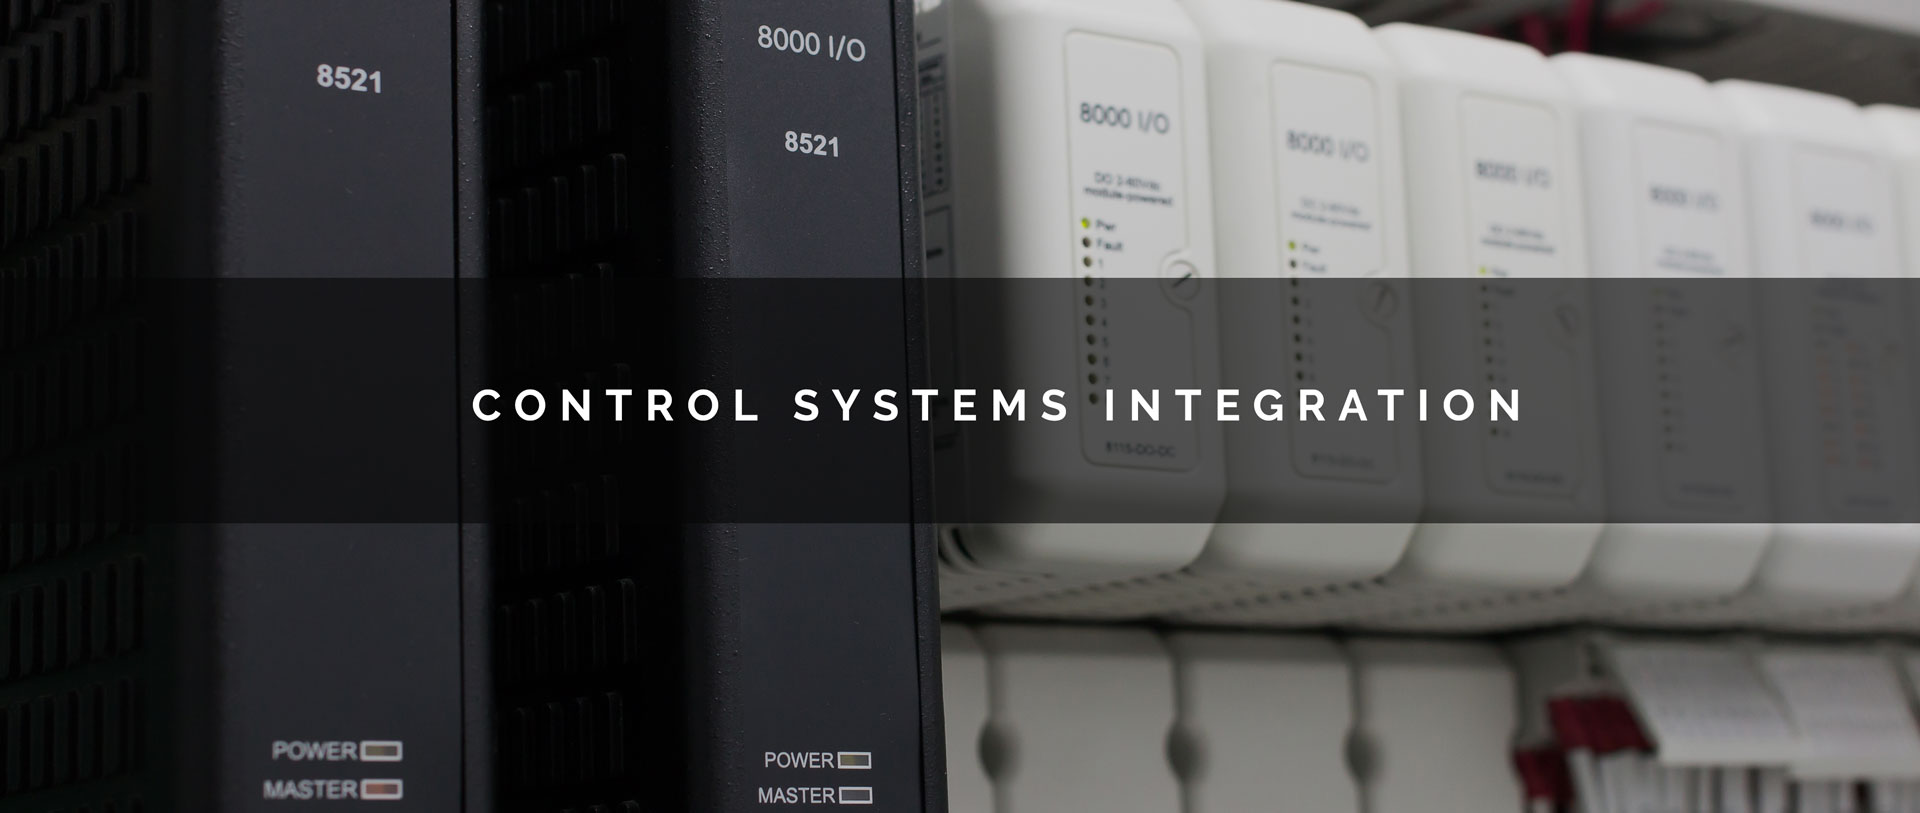 Controls-Systems-Integration-PLC